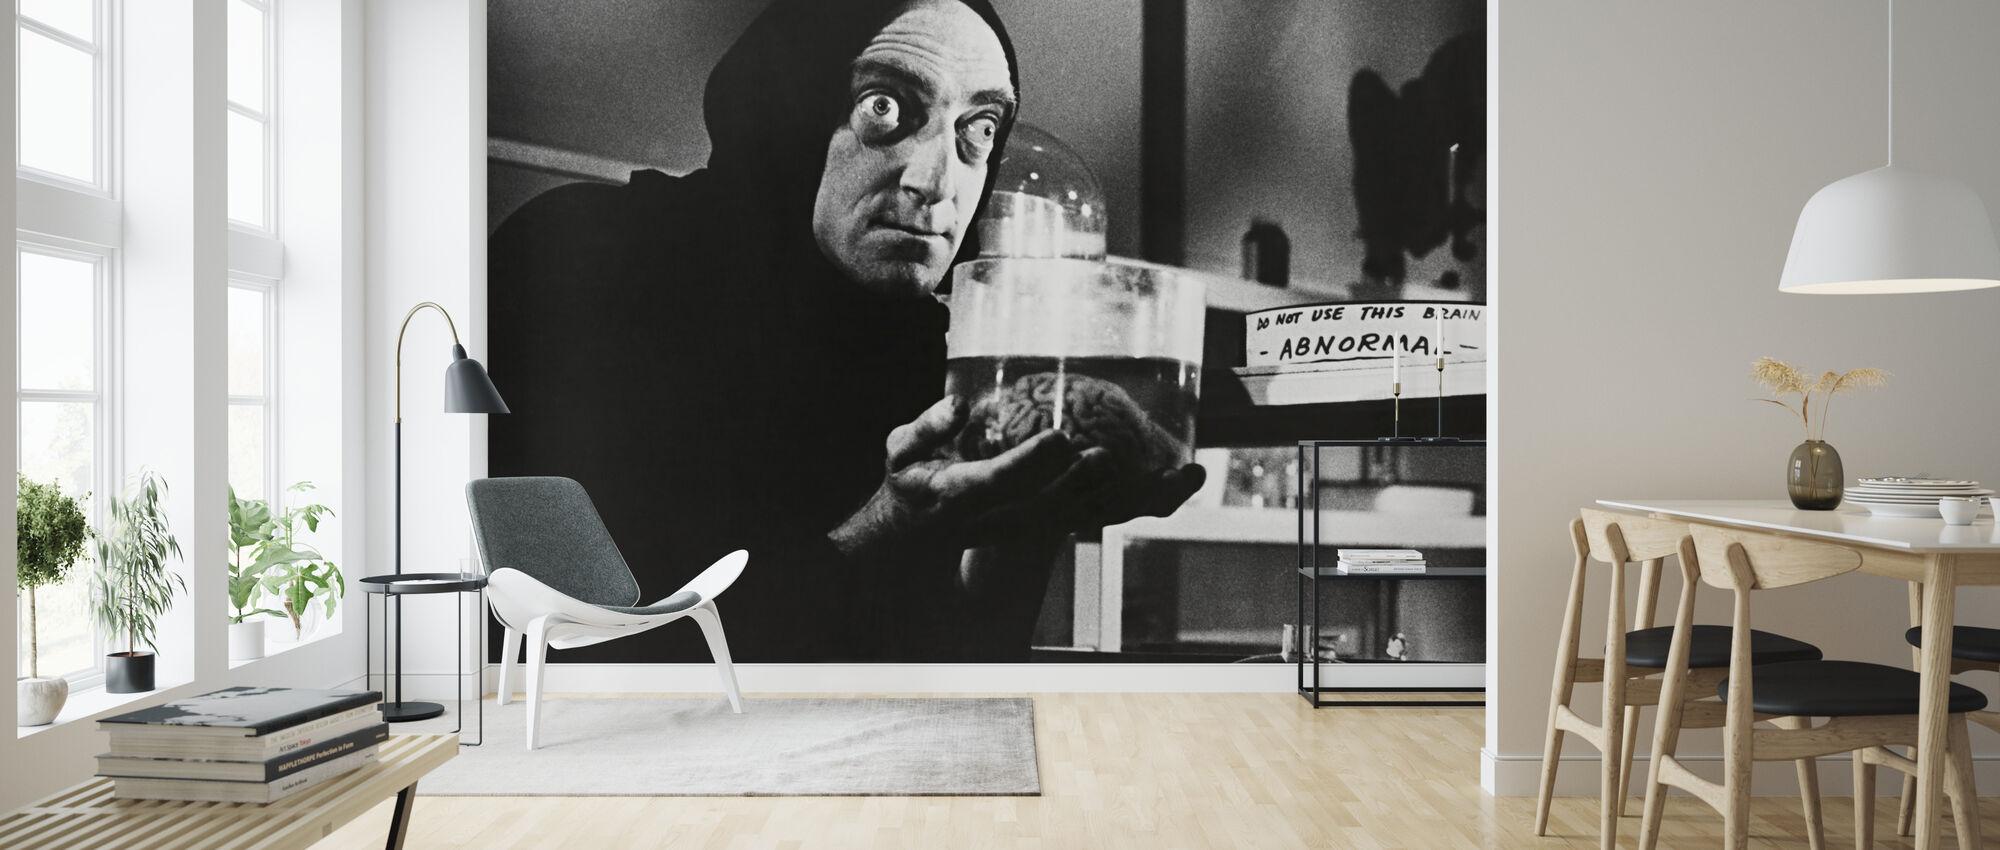 Young Frankenstein - Marty Feldman - Wallpaper - Living Room